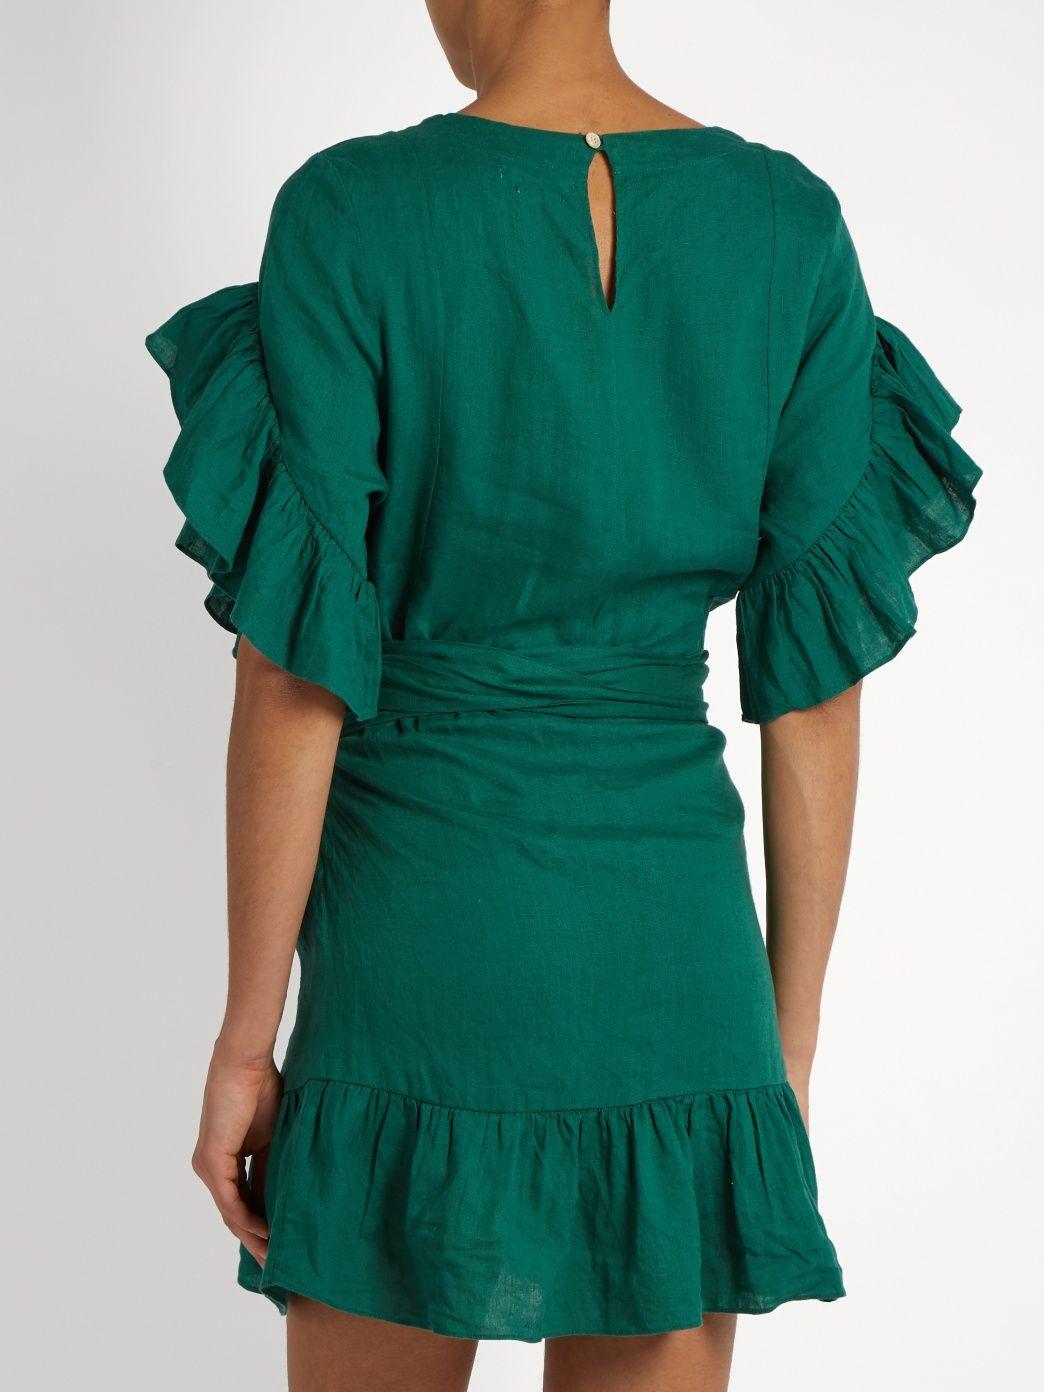 b386d7f377 Click here to buy Isabel Marant Étoile Delicia ruffled linen mini dress at  MATCHESFASHION.COM